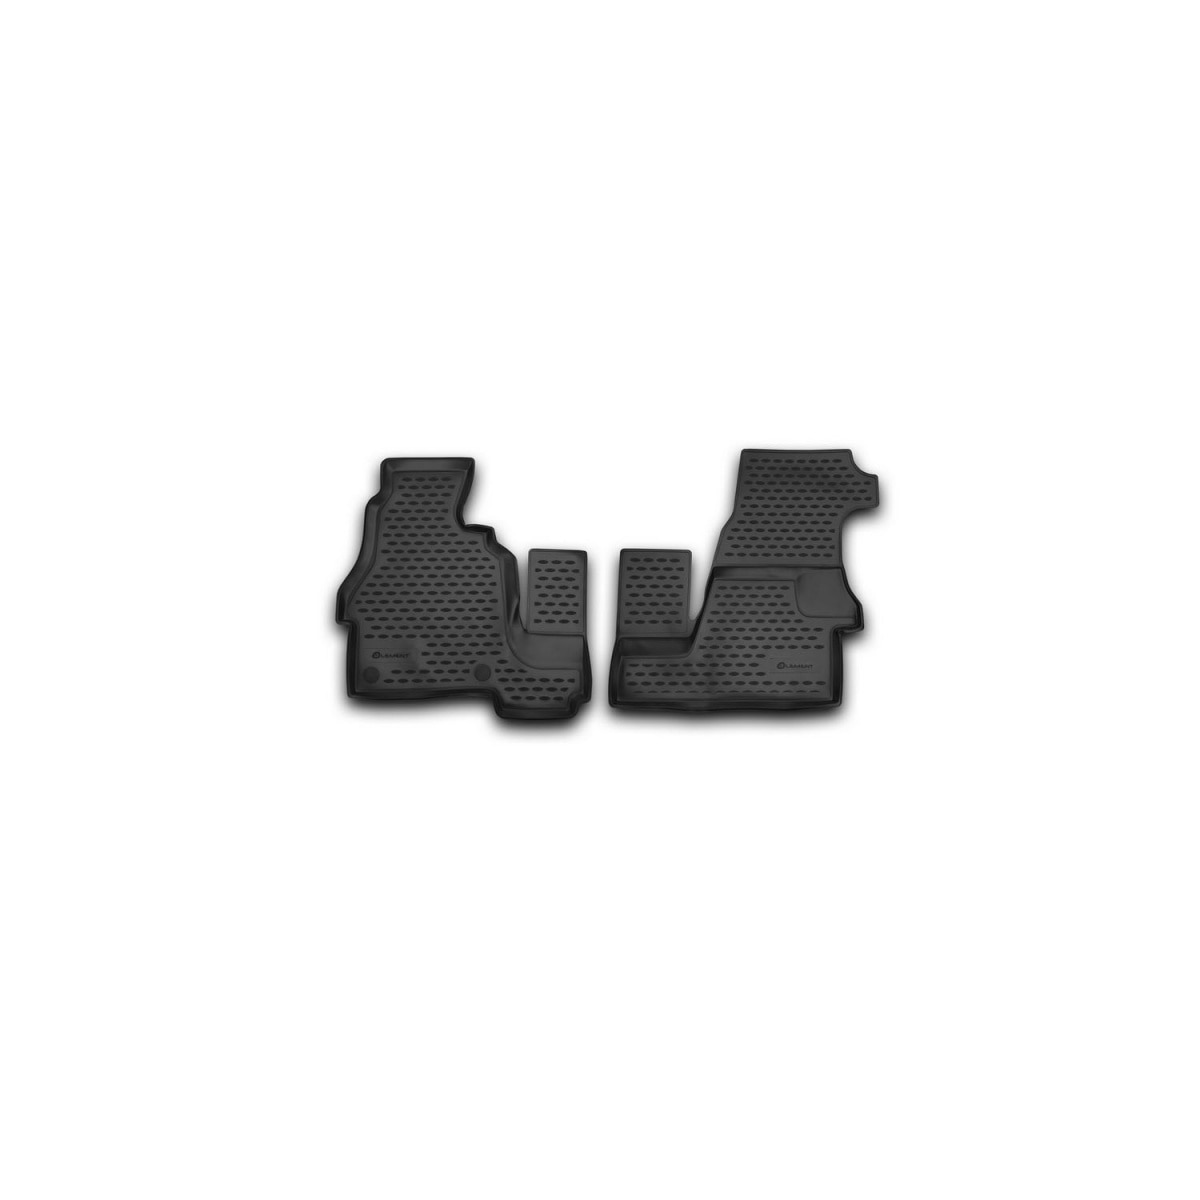 Tapis de sol mercedes-benz Sprinter Classic, 2013-2 pièces (PolyU